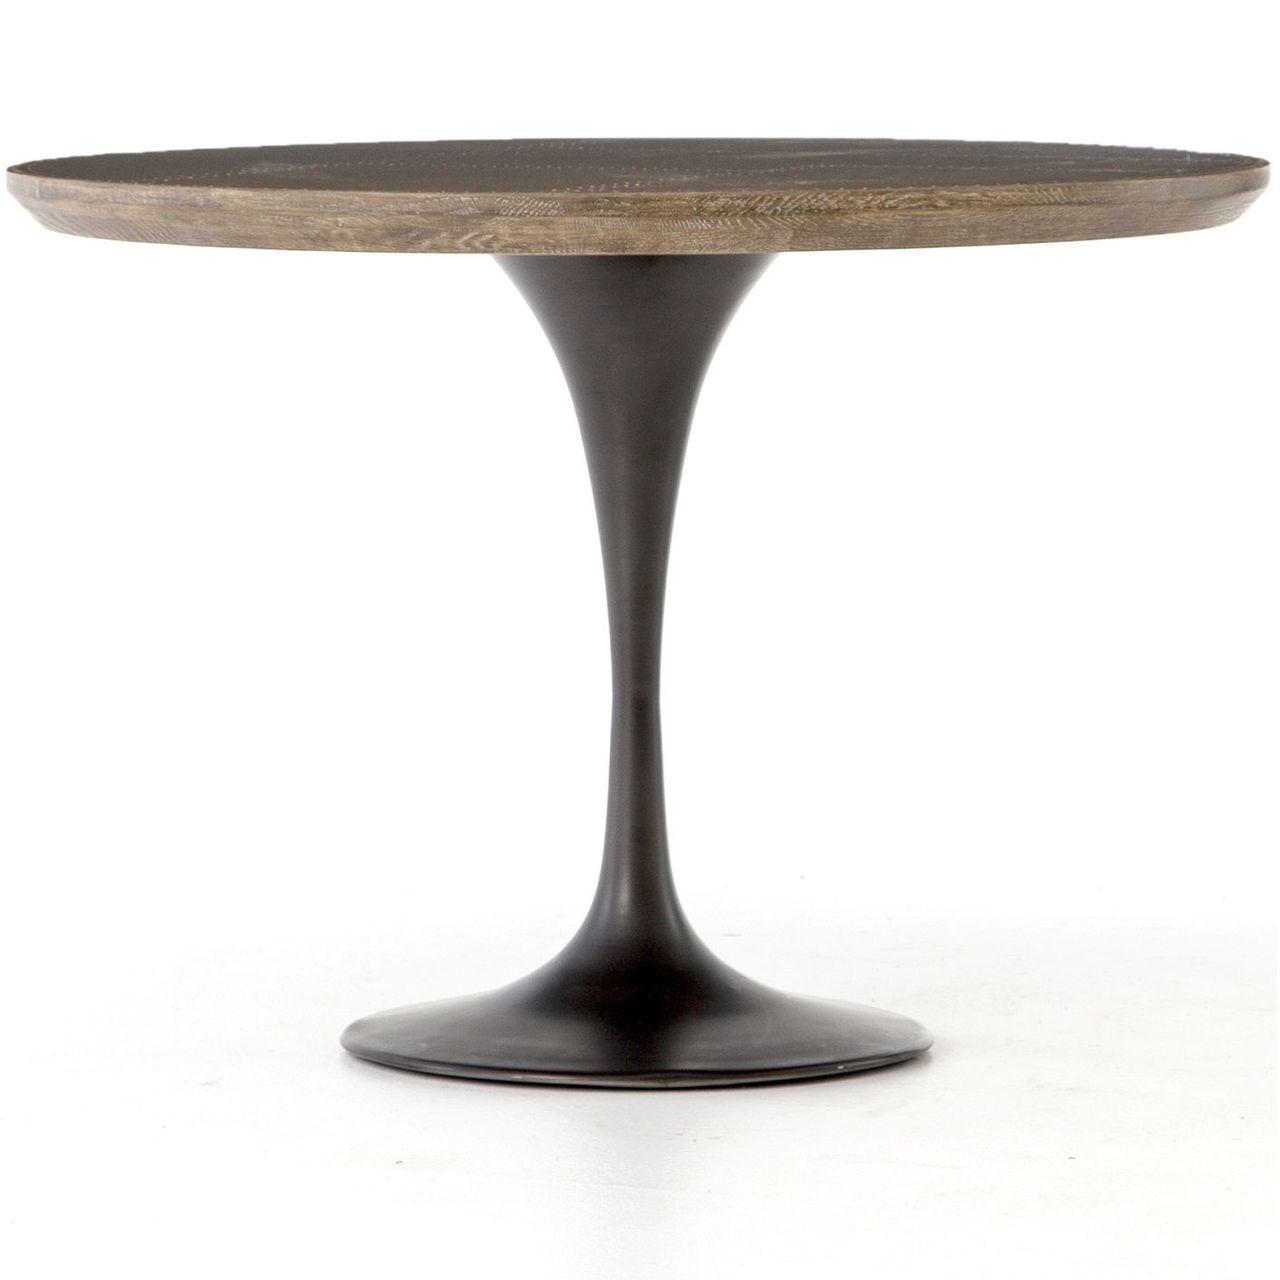 Aero tulip industrial brass clad top round dining table 42